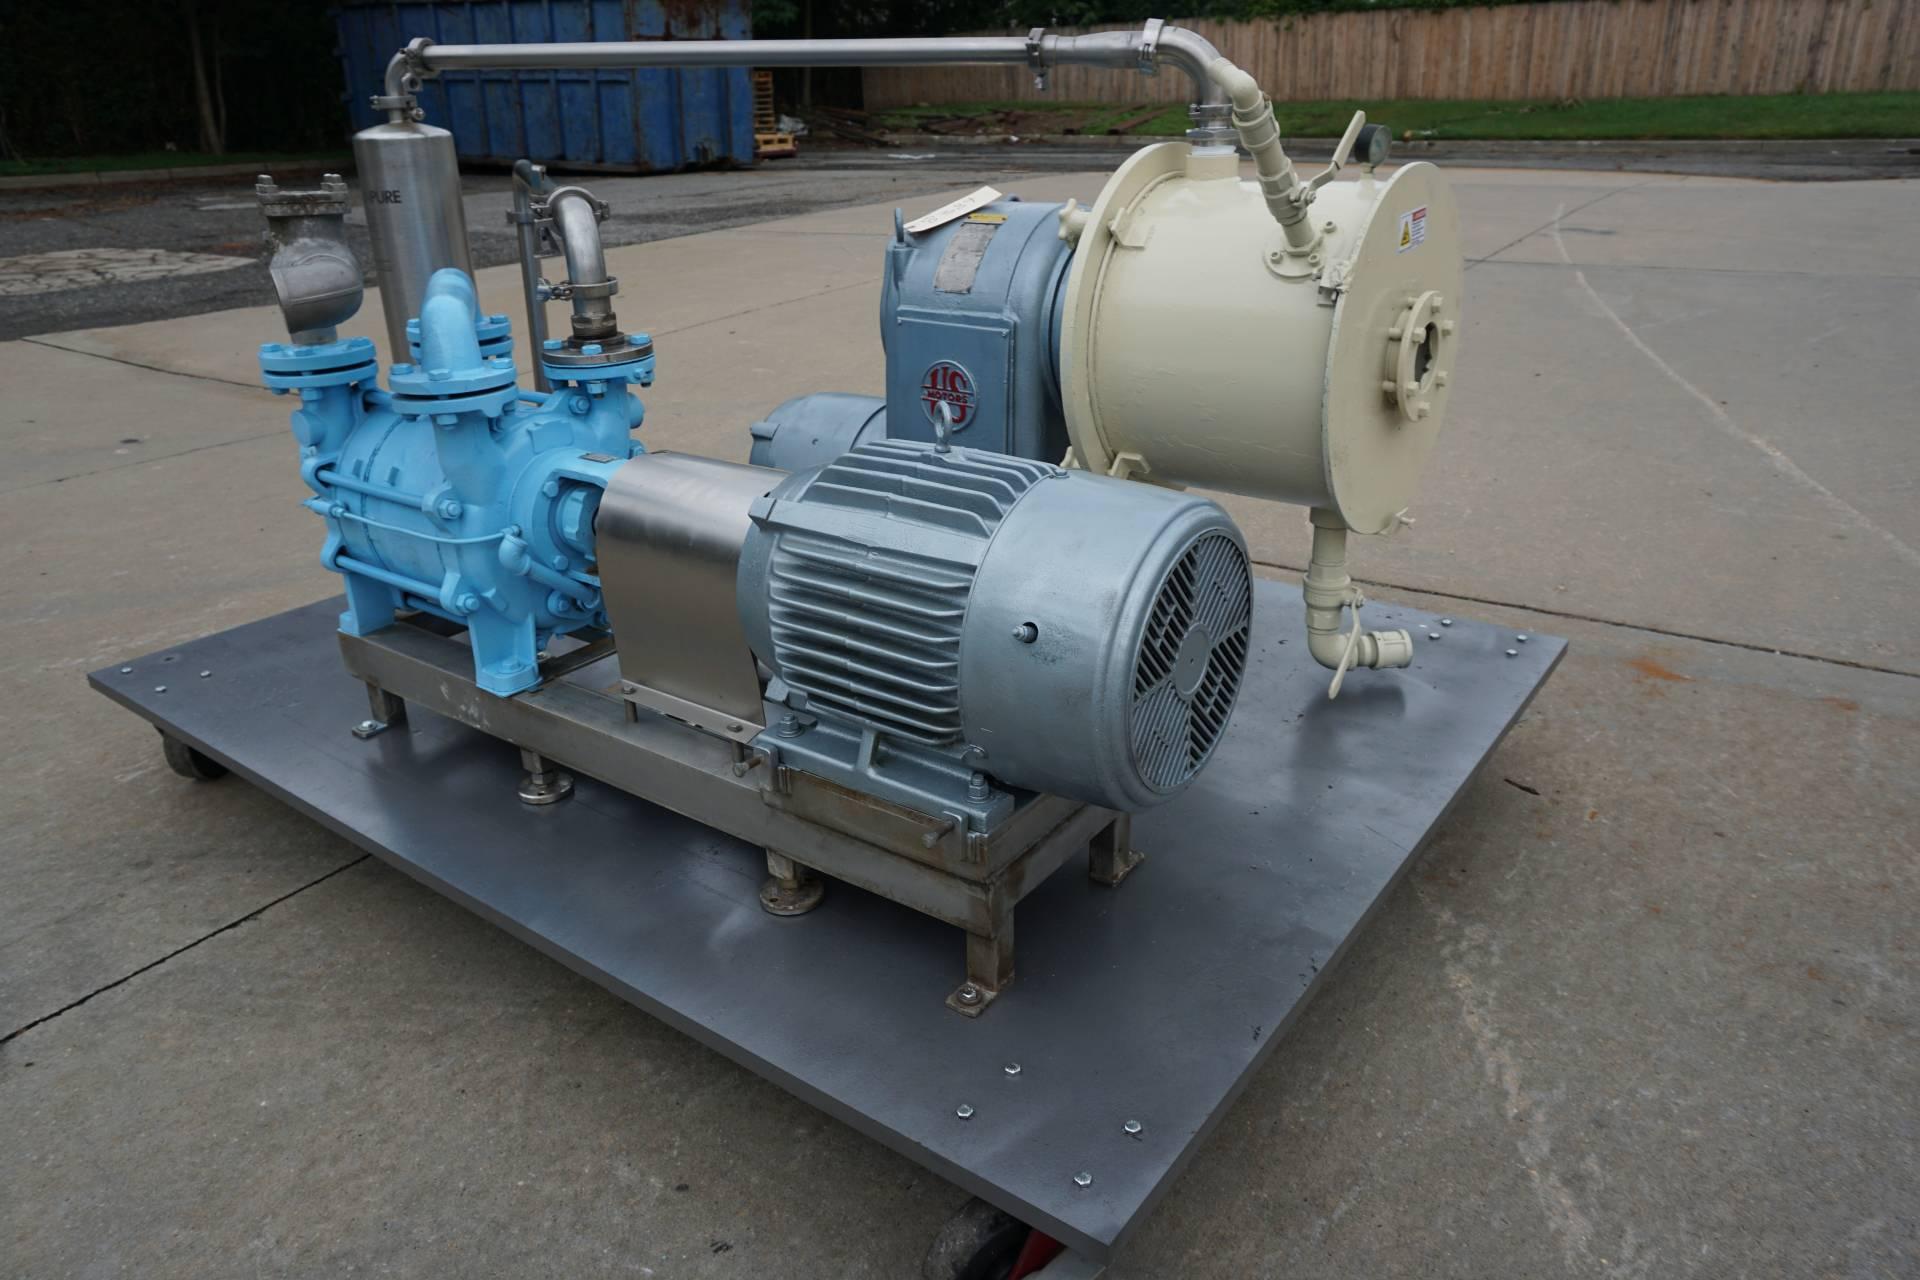 Cornell D16 Versator Deaerator With SIHI Vacuum Pump